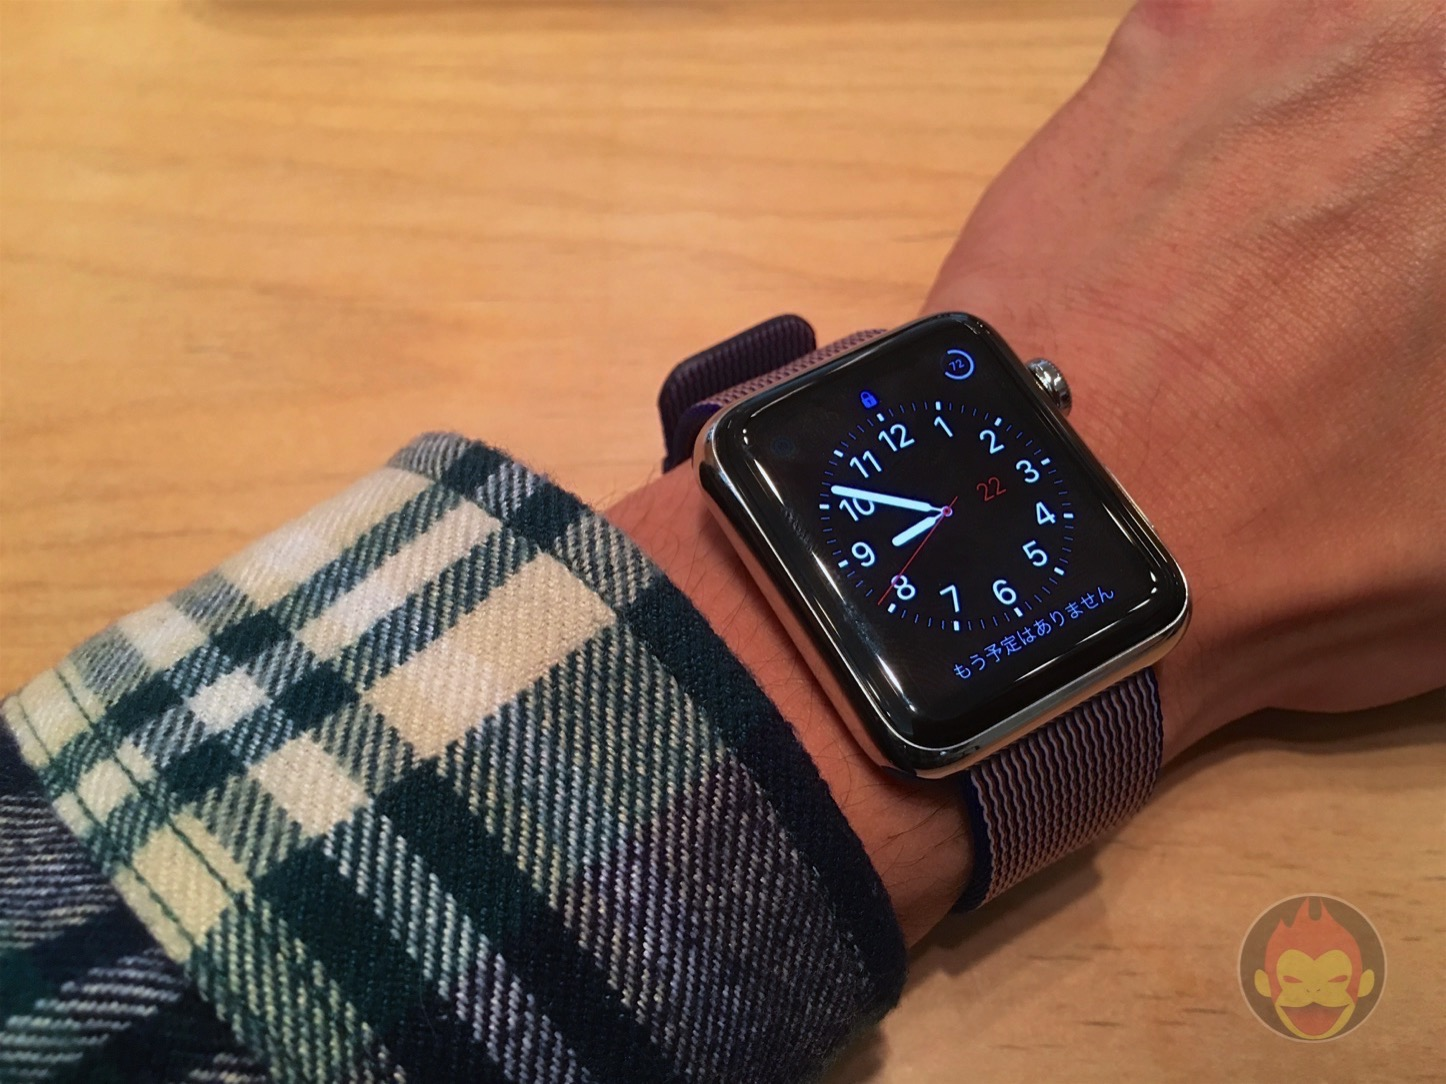 Apple-Watch-Woven-Nylon-Band-16.jpg